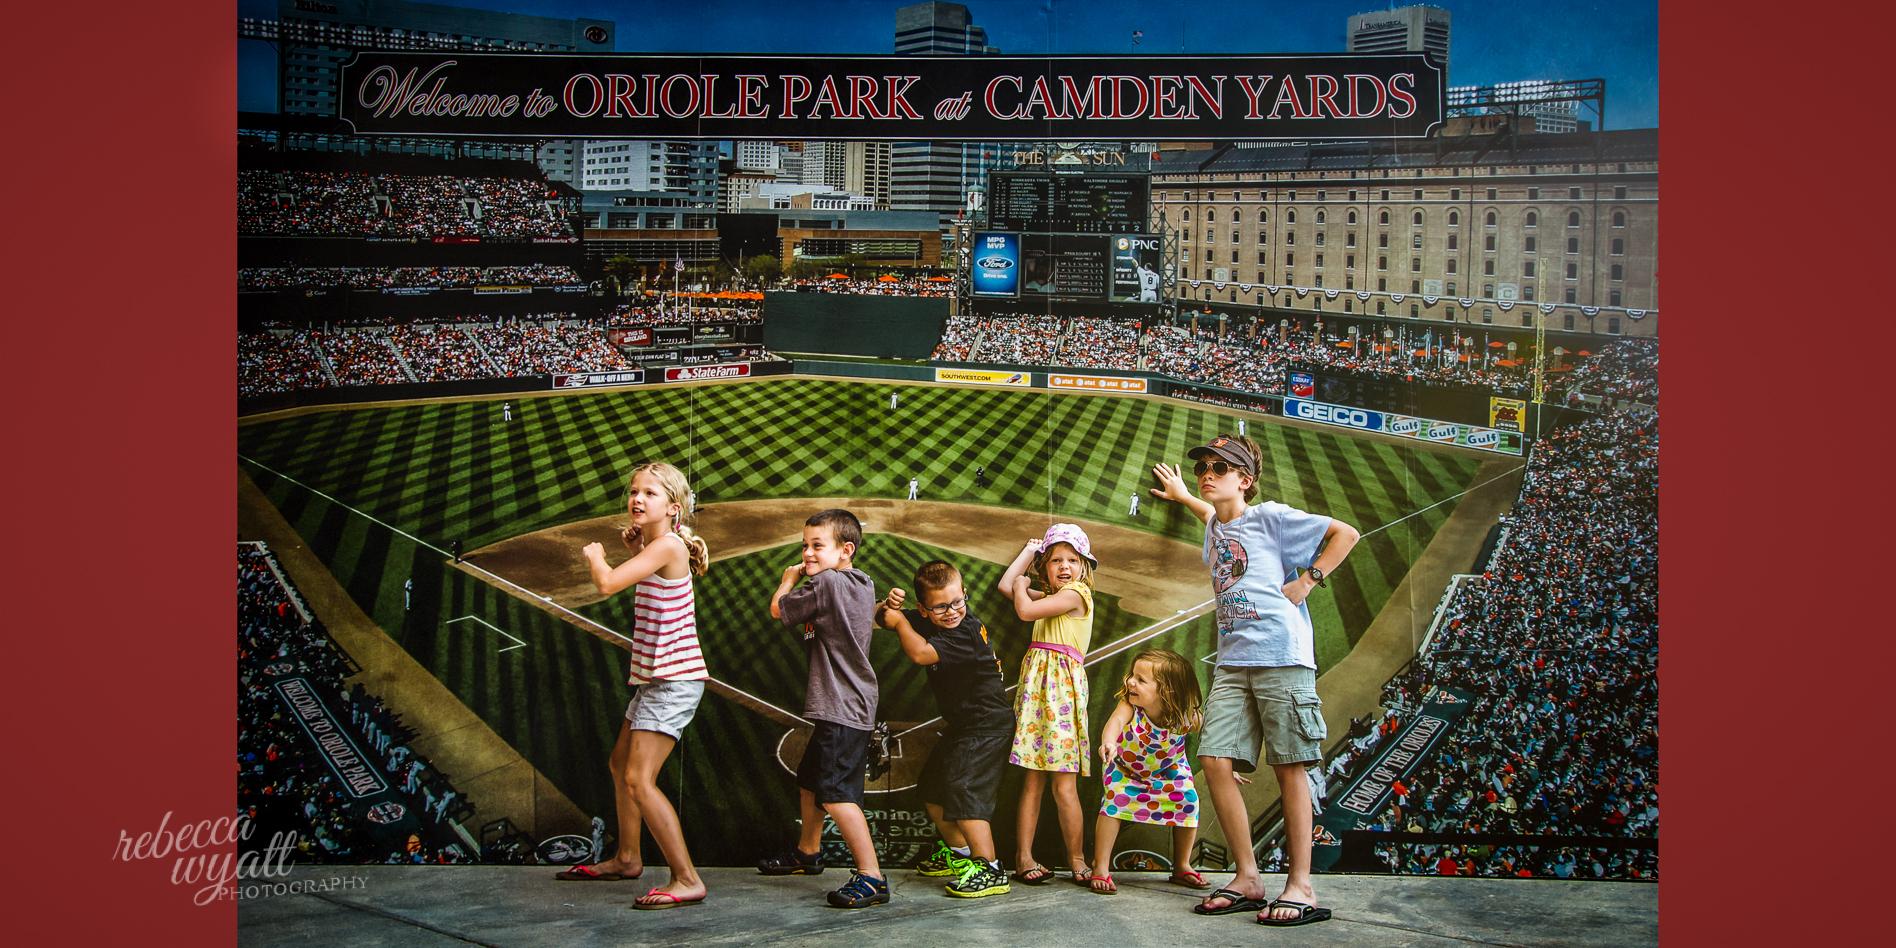 Family at Orioles Game at Camden Yards